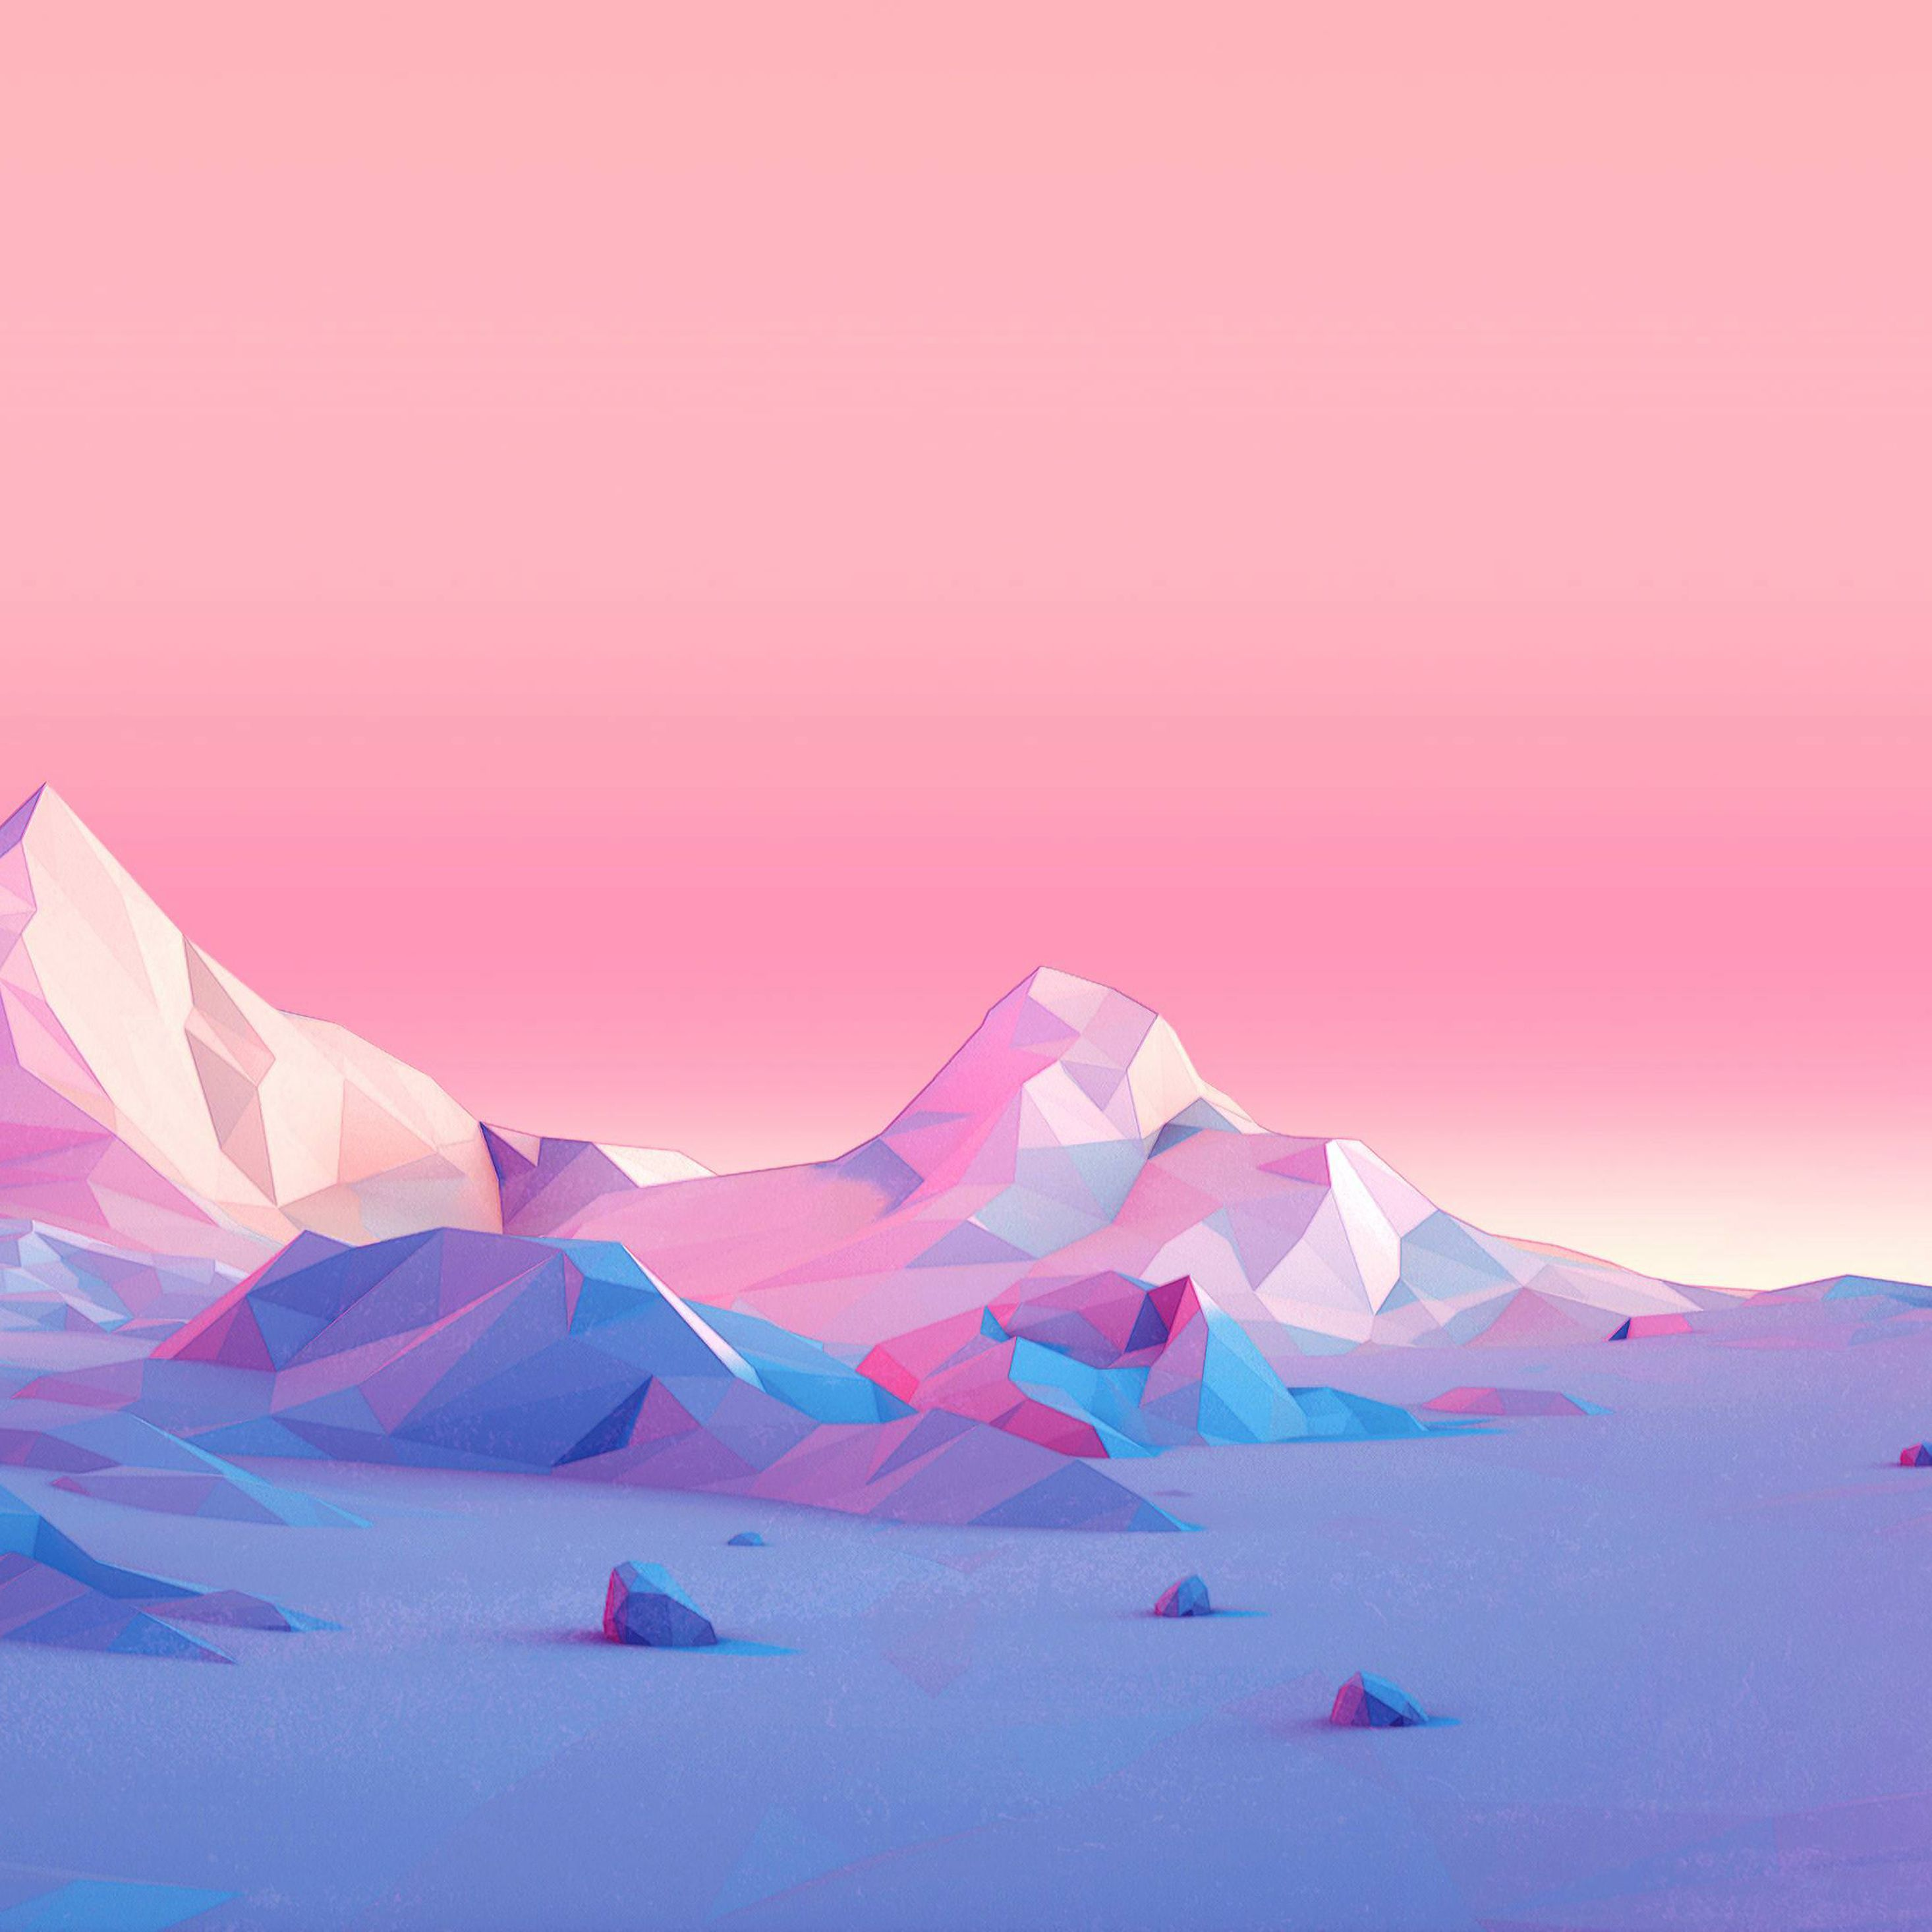 Minimalist Ipad Wallpapers Top Free Minimalist Ipad